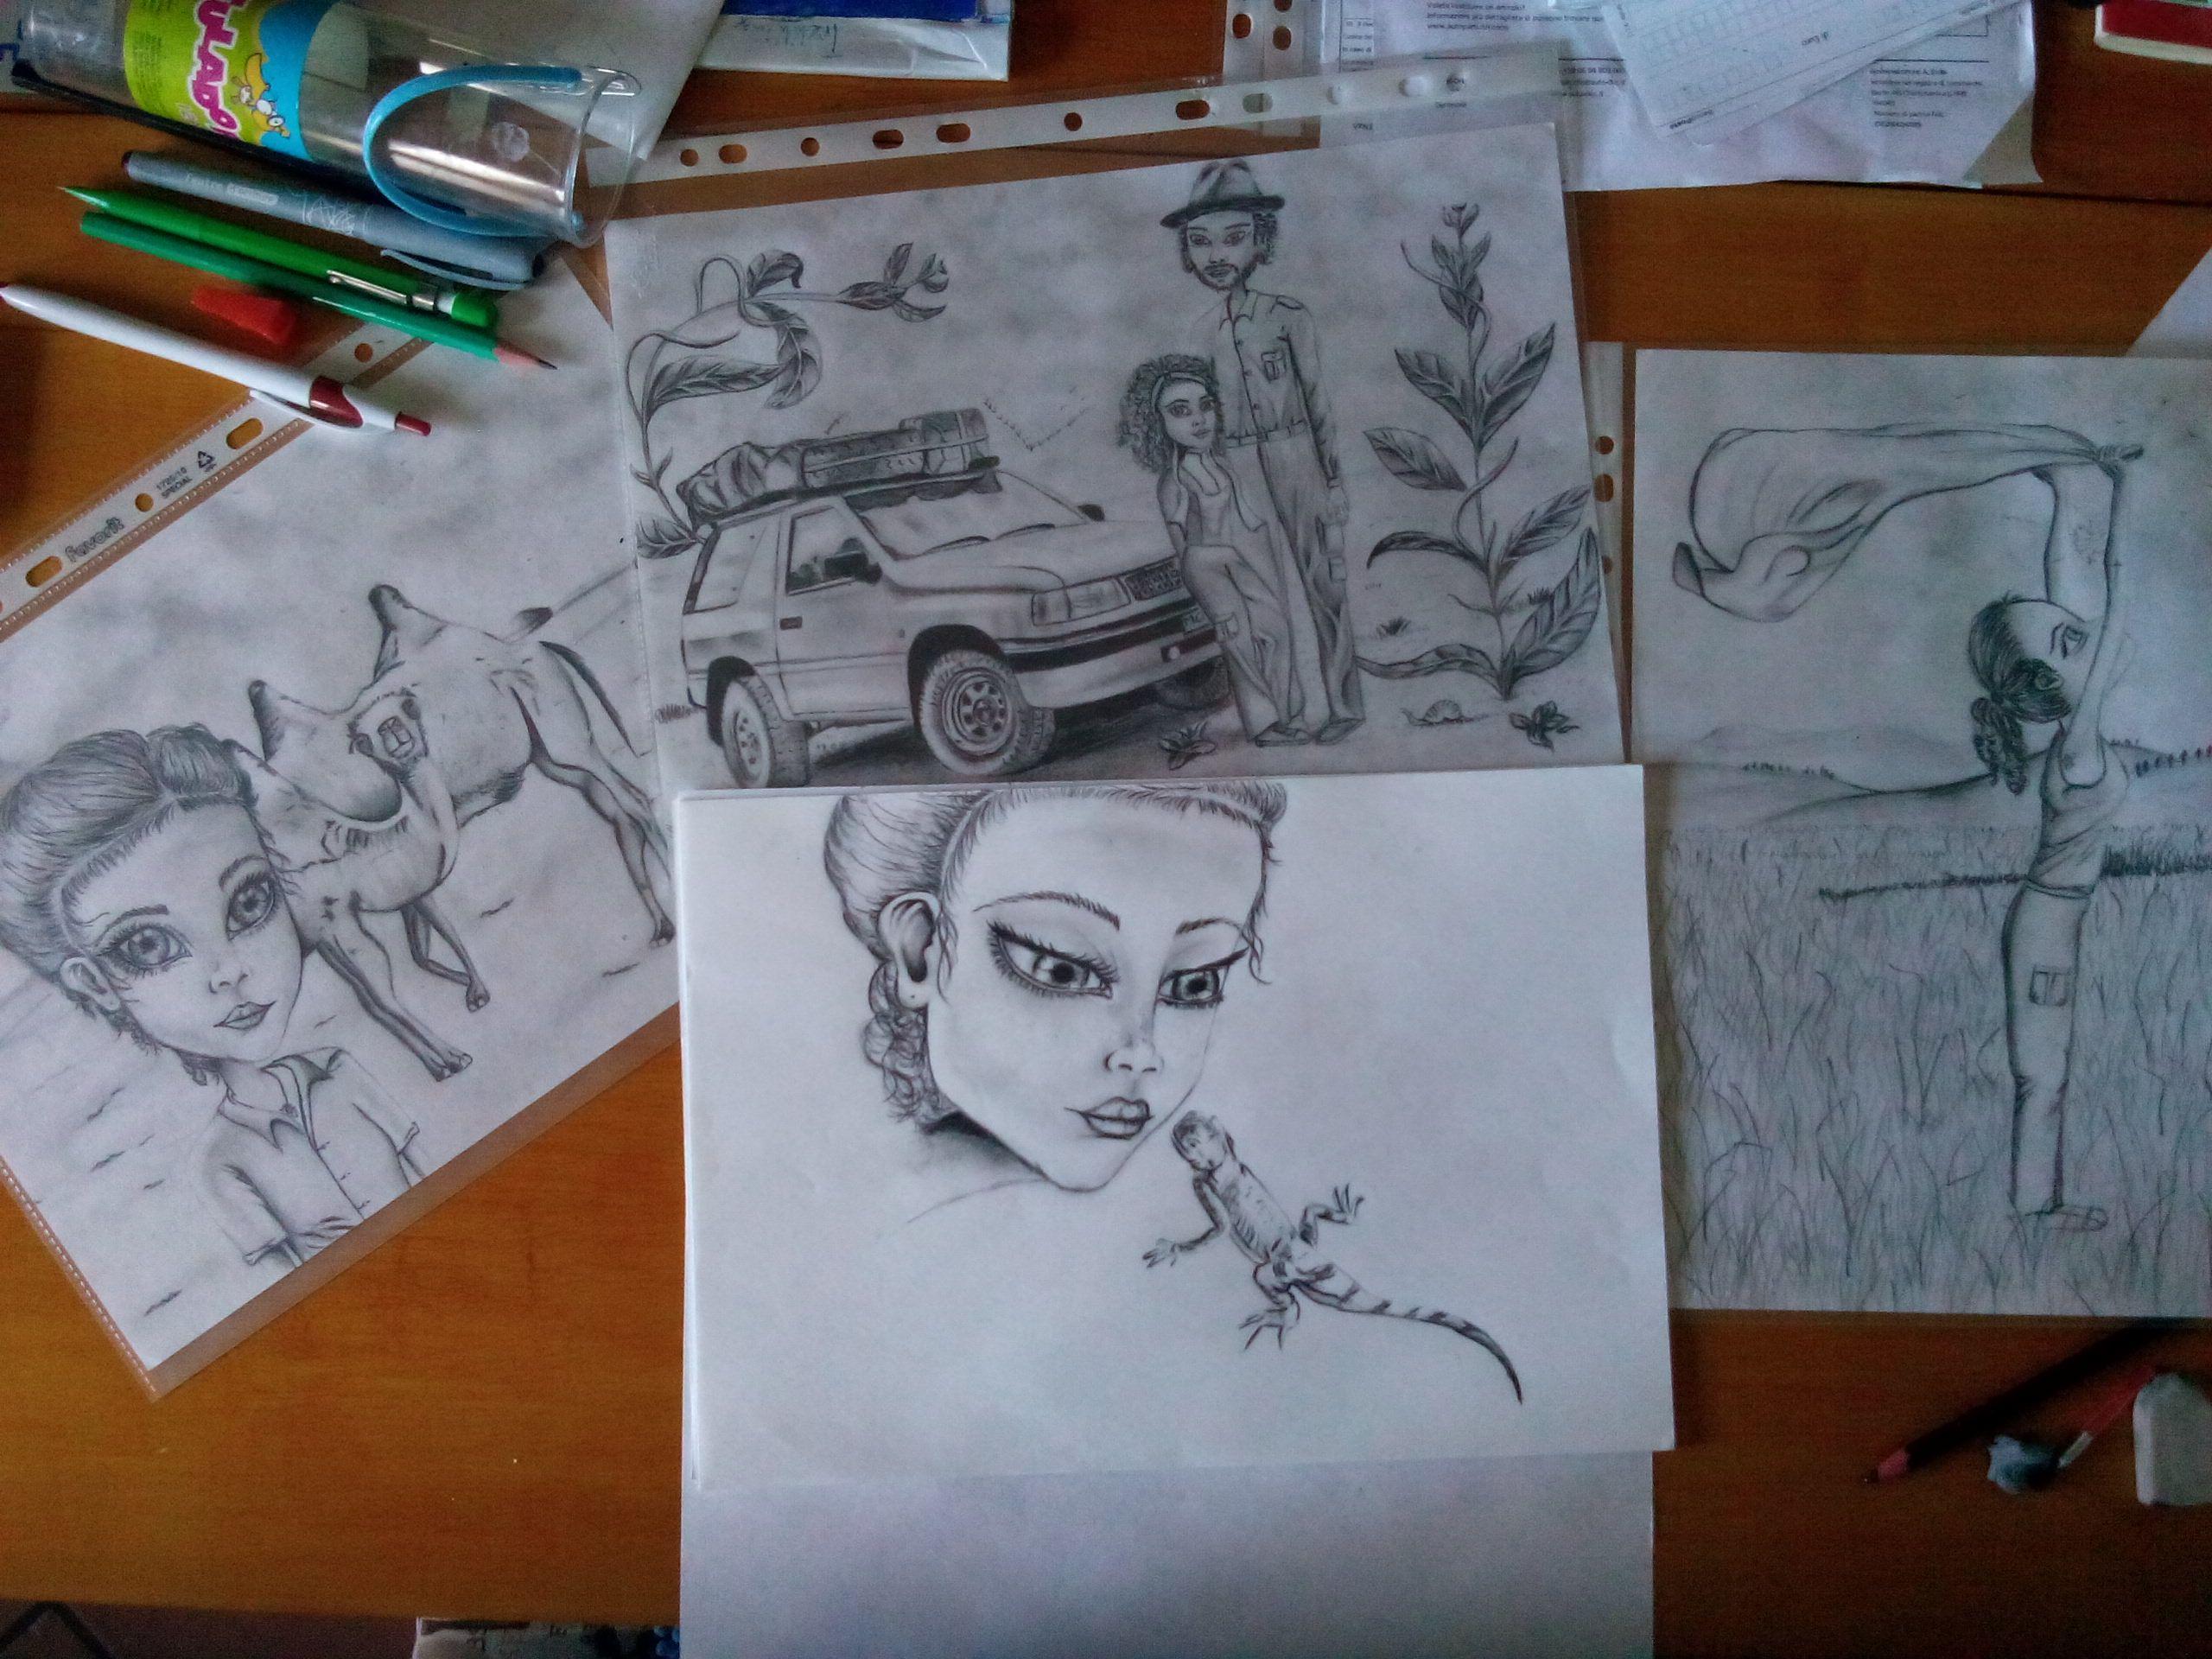 http://angelafaillaart.blogspot.it